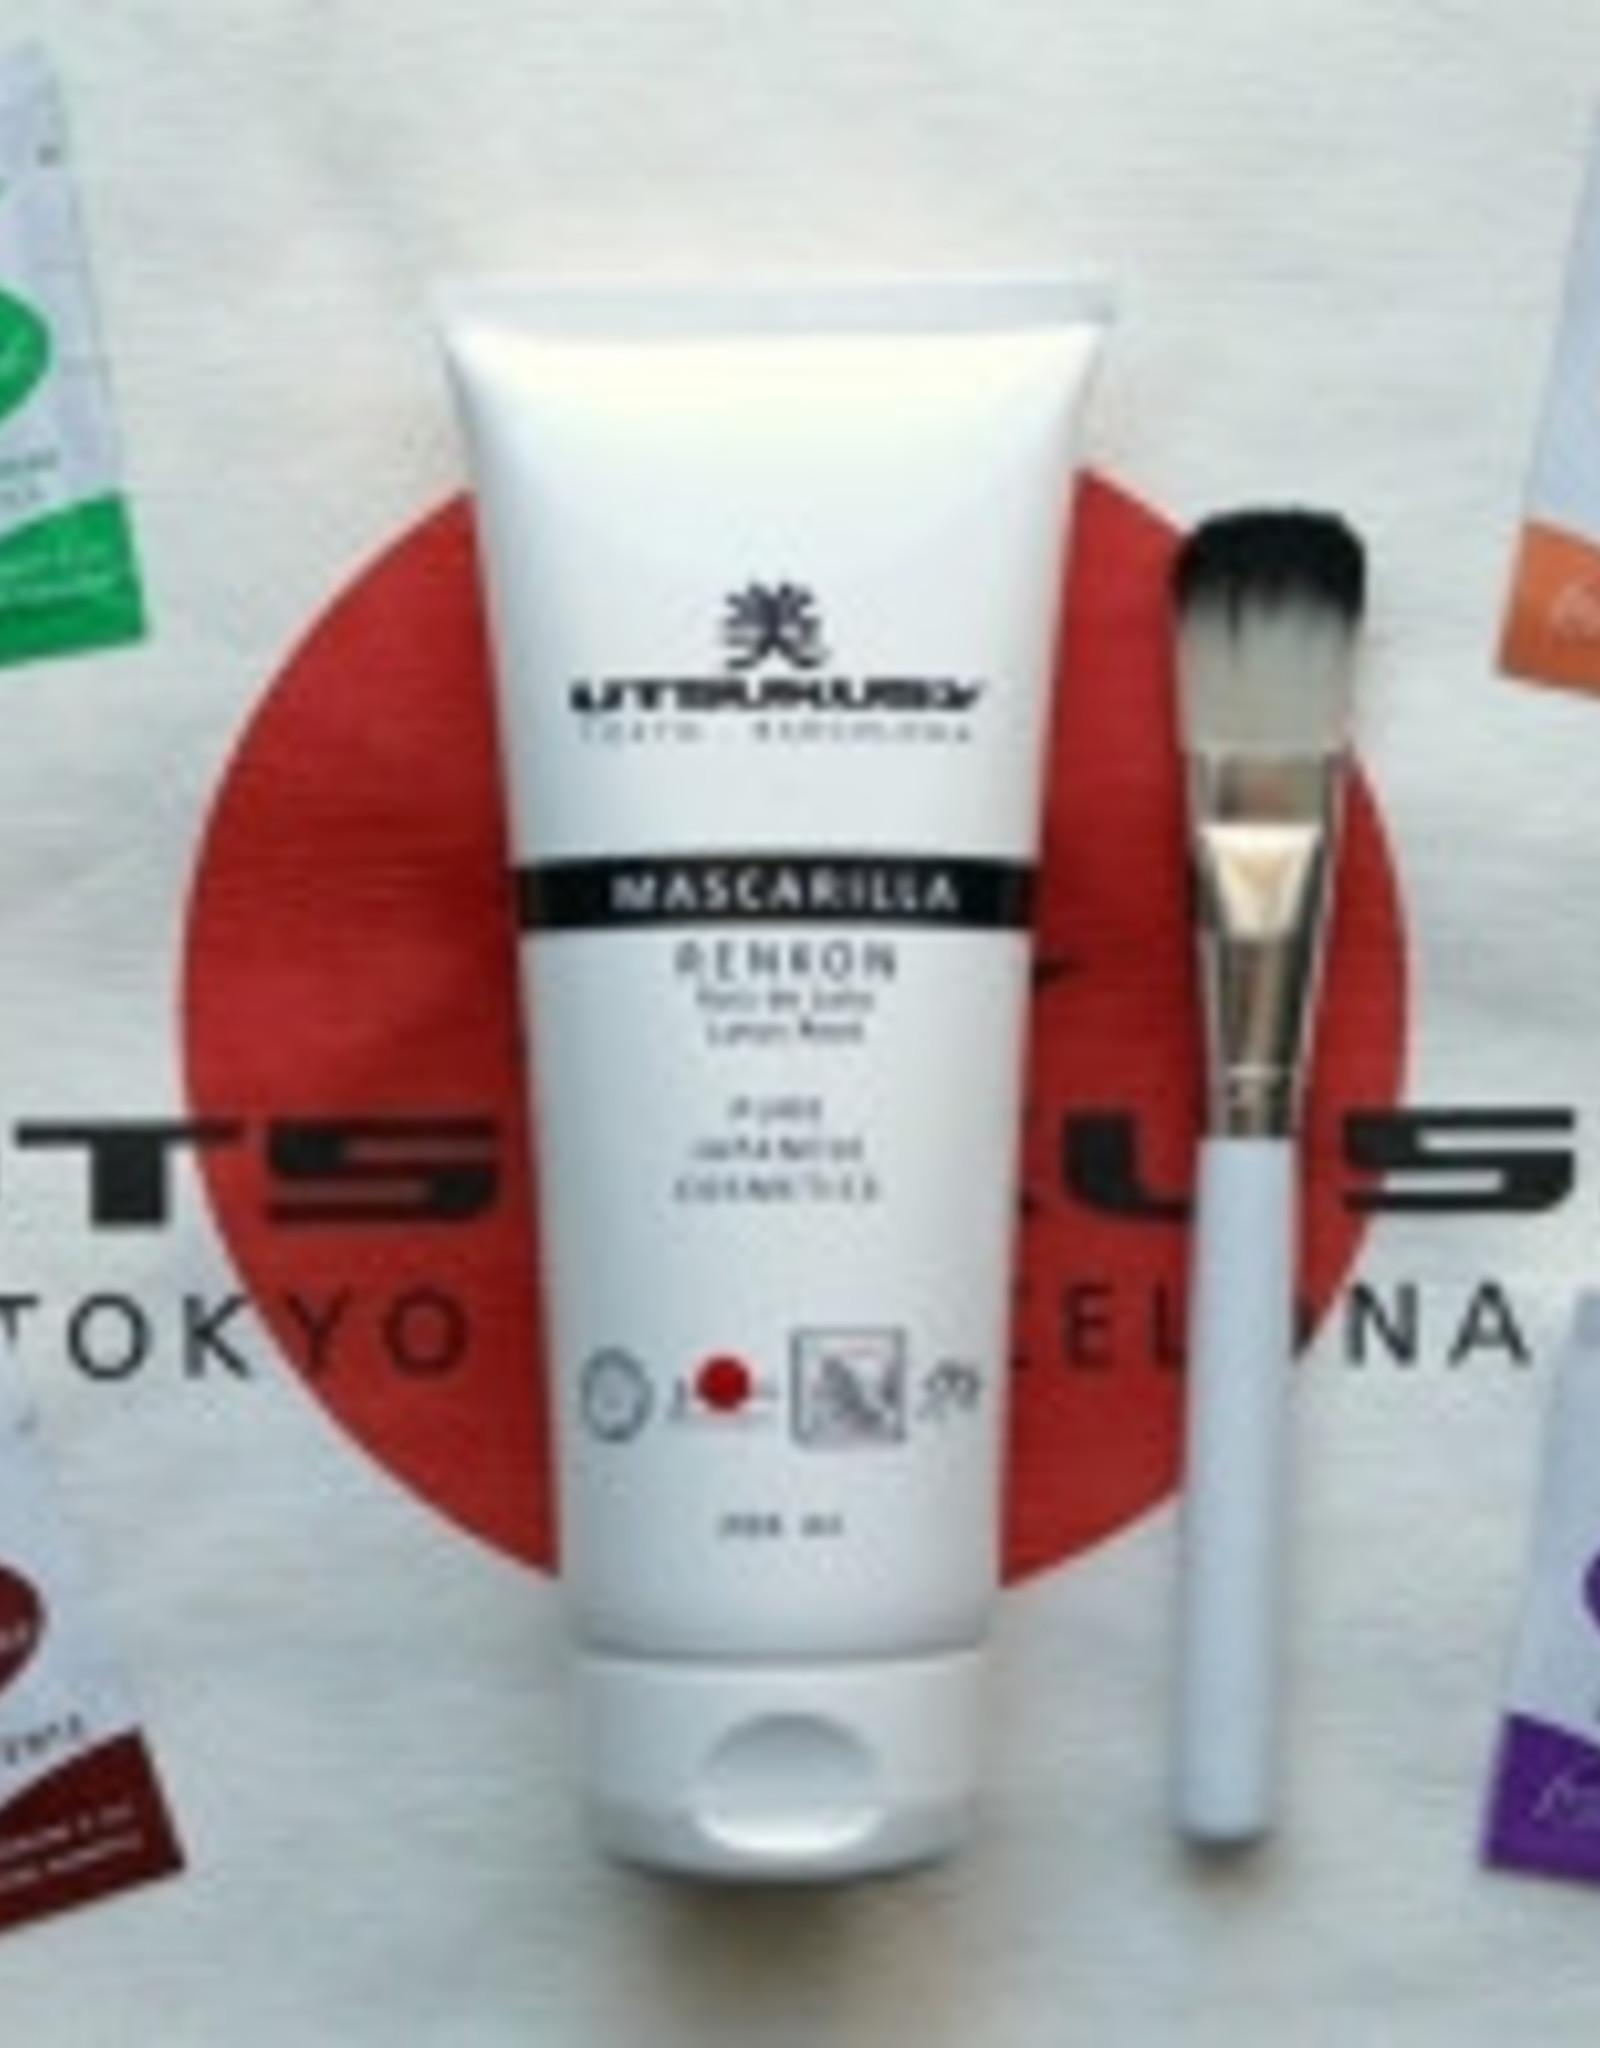 Utsukusy Shashimi Renkon masker